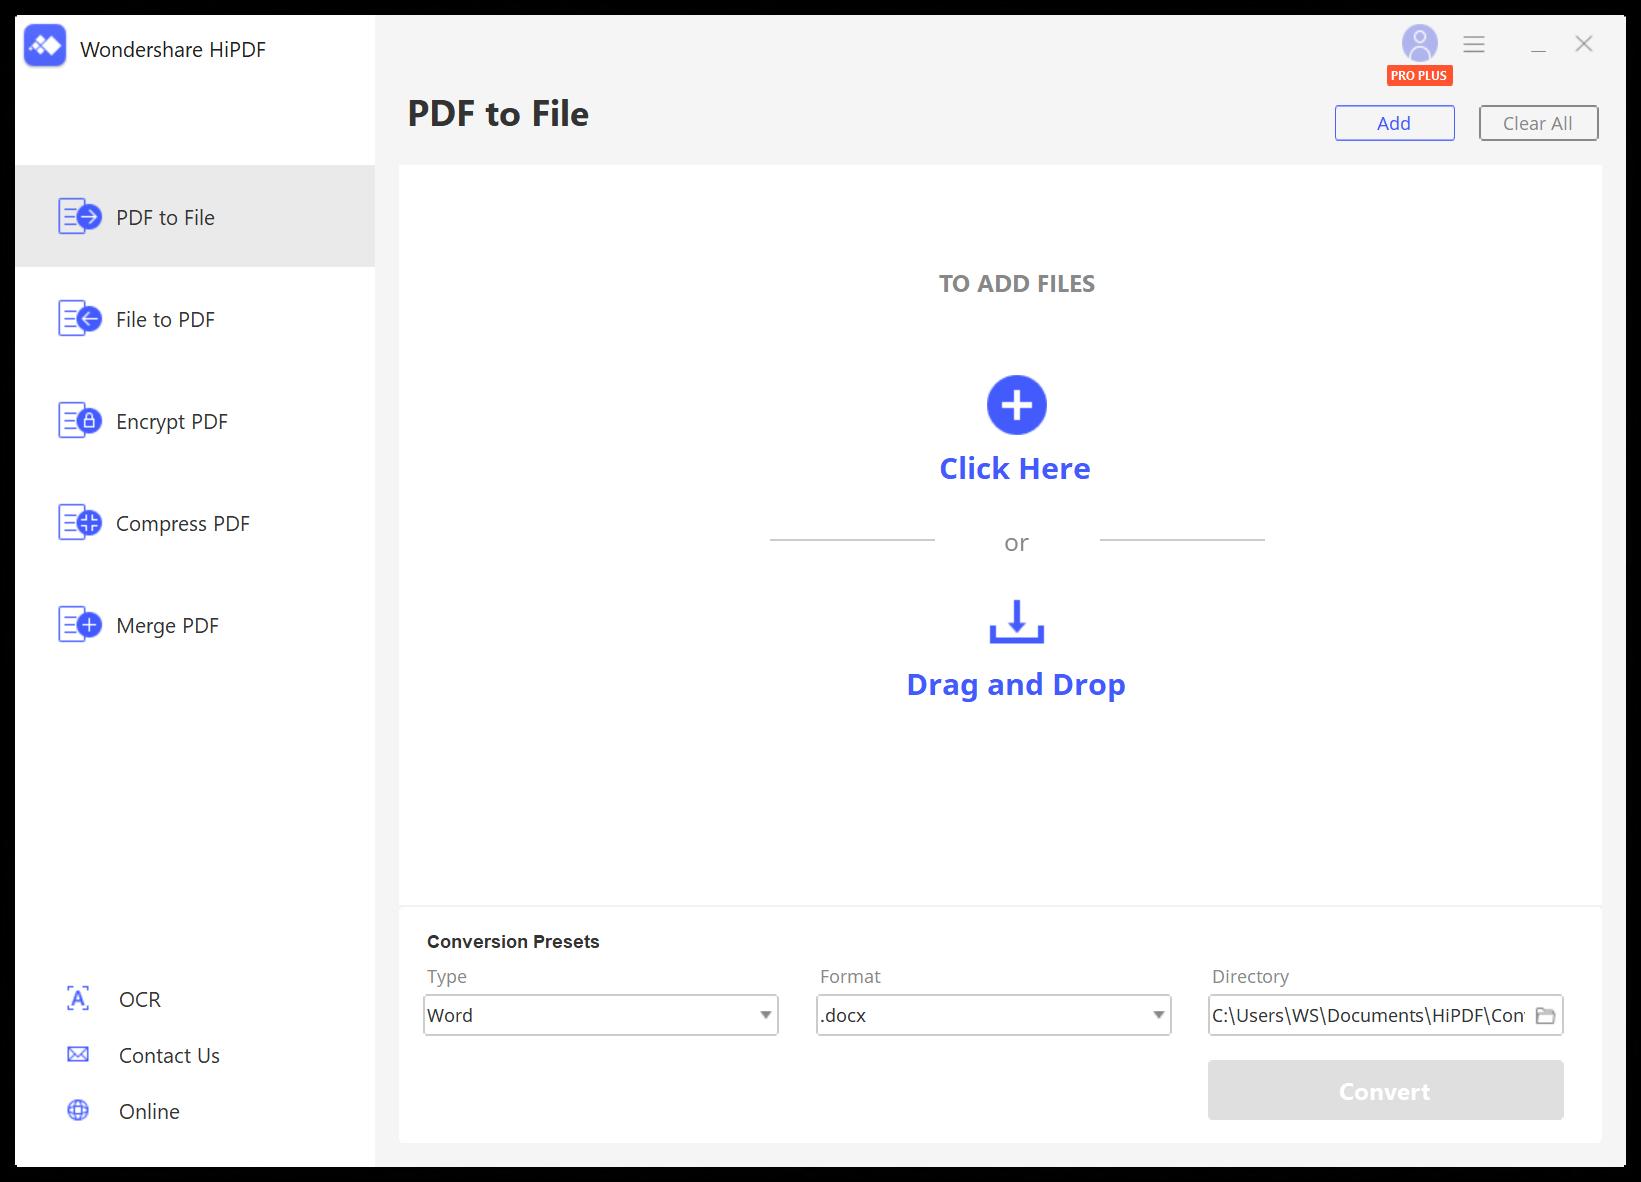 PDF to File page